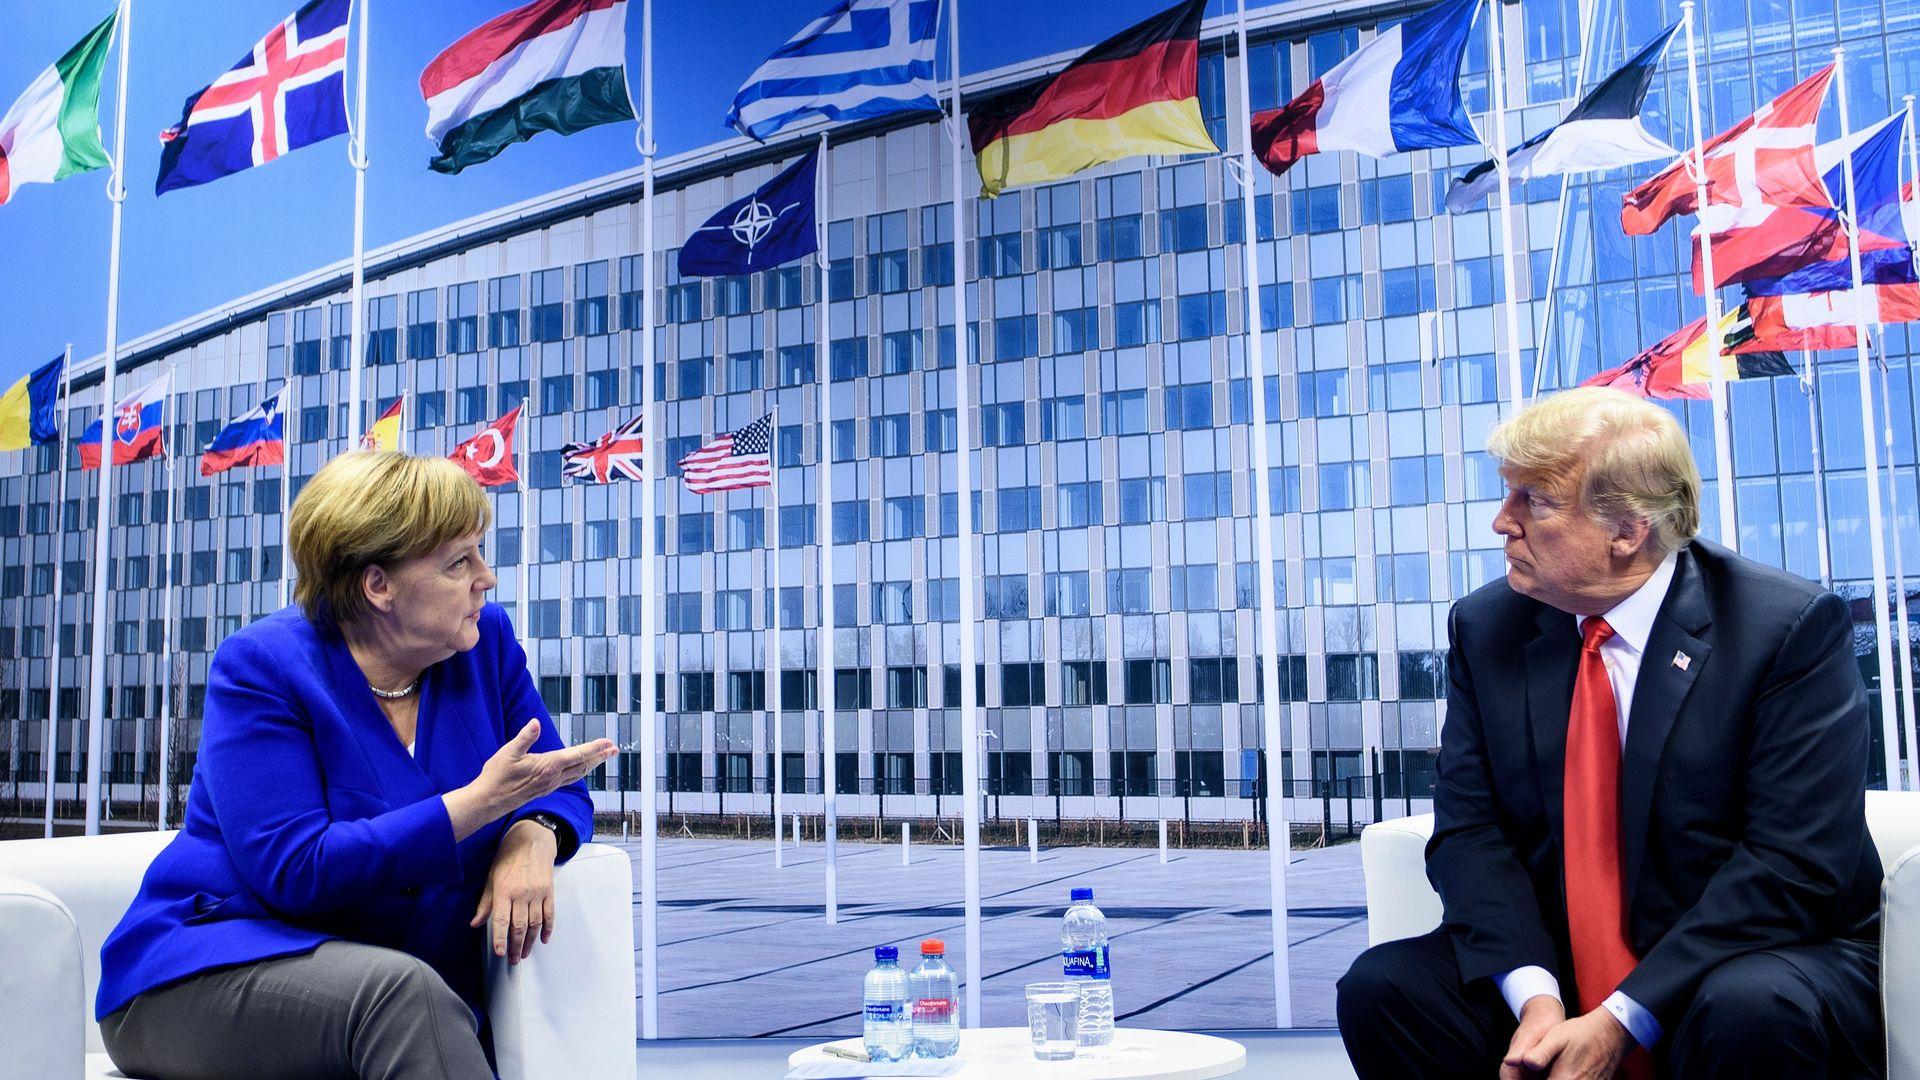 German Chancellor Angela Merkel and US President Donald Trump